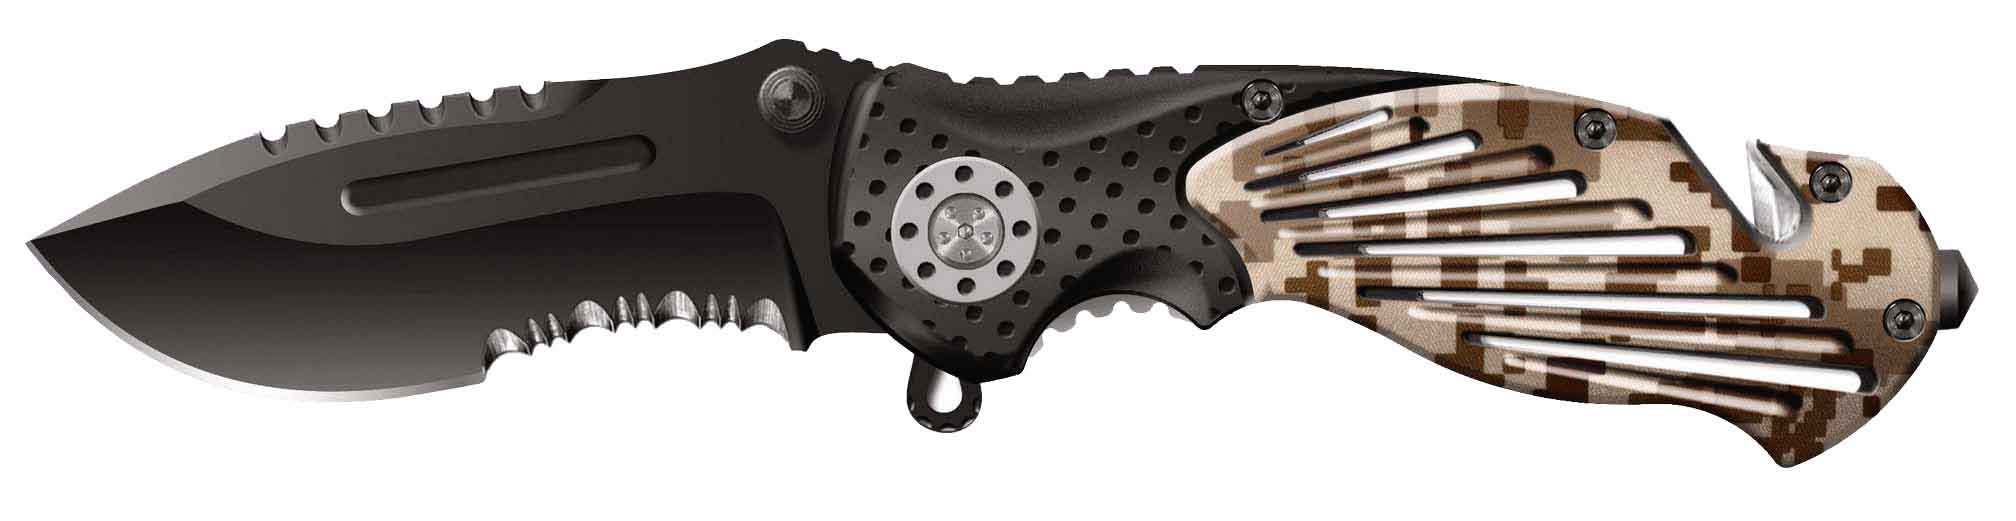 Фото 2 - Нож складной Stinger SA-580DC, сталь 420, алюминий